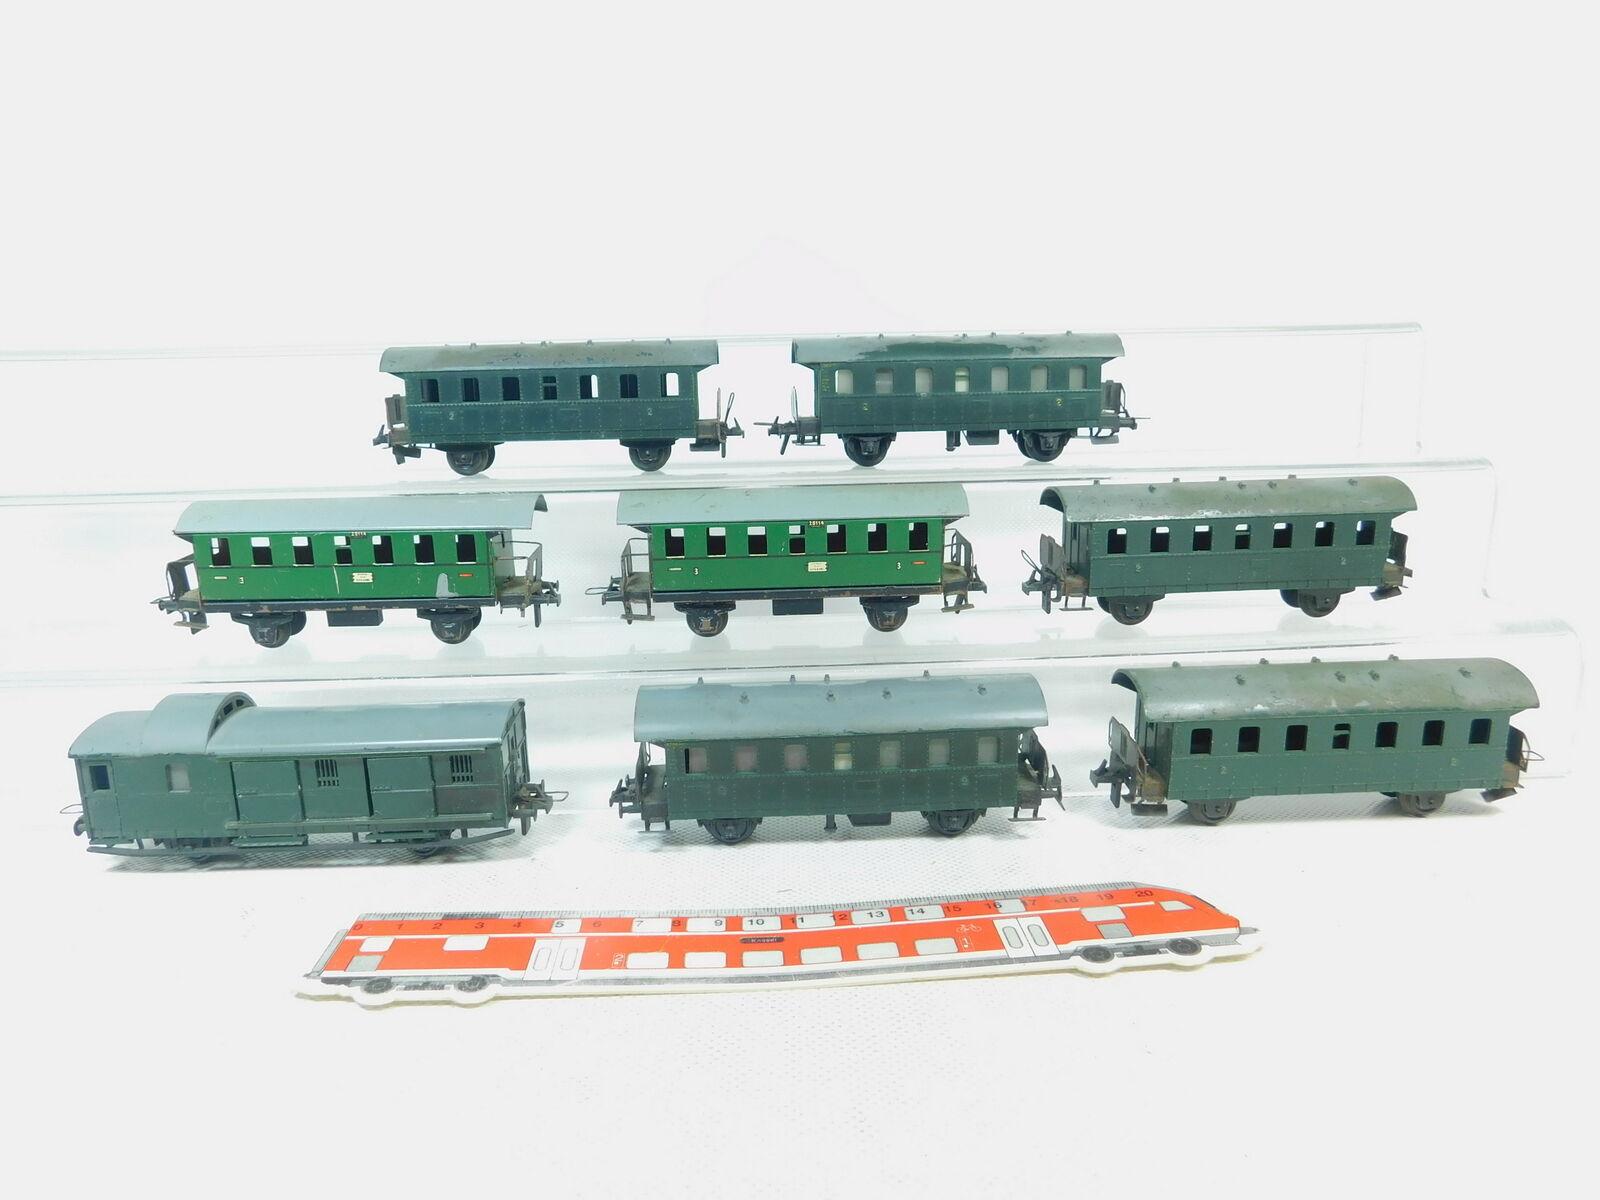 Bm533-1 x Trix Express H0 DC Passenger Car 20114+ 83694 etc. ,Artisan 2nd